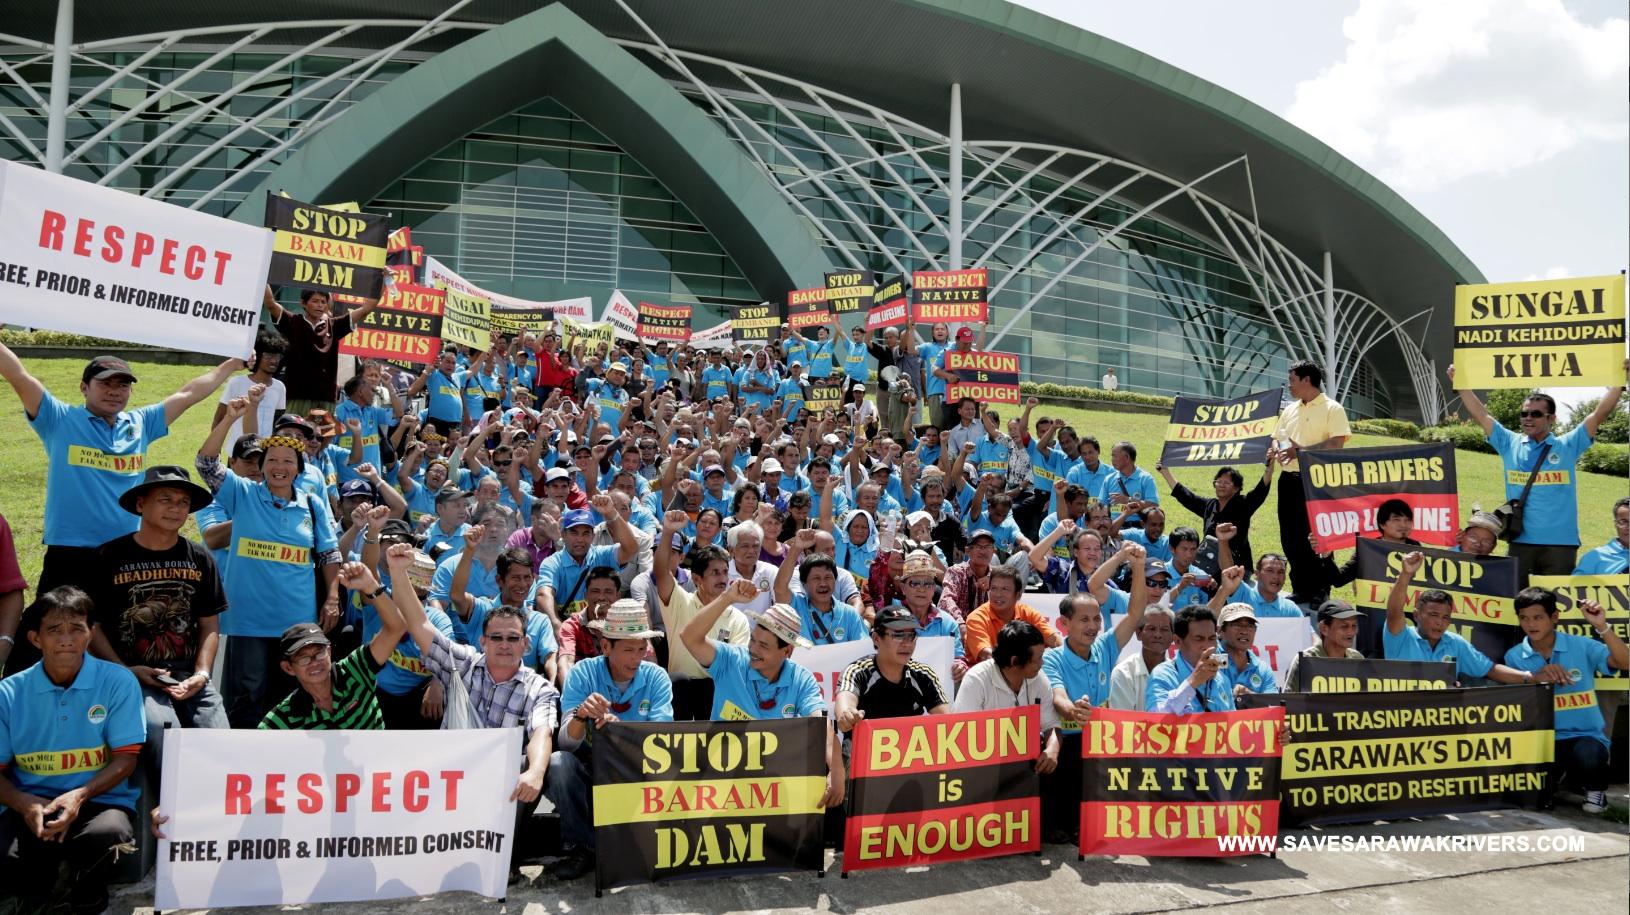 http://intercontinentalcry.org/wp-content/uploads/2013/05/01_kuching_dams_protest_iha_2013_05_22.jpg